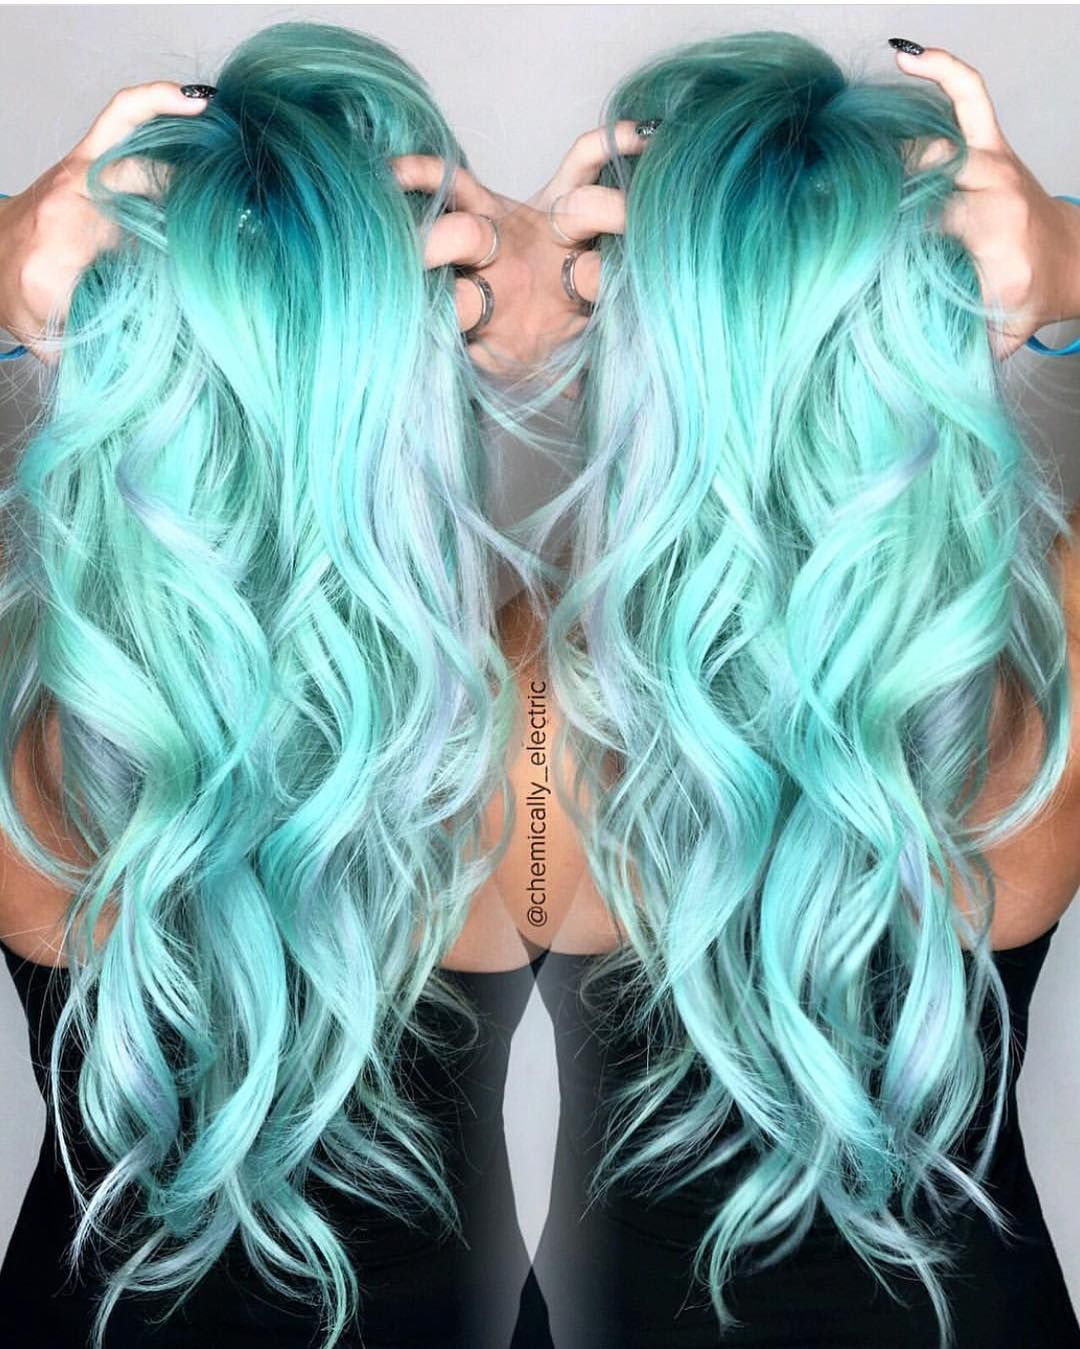 Hairstylesbeauty Aqua Hair Color Hair Color Pastel Hair Styles